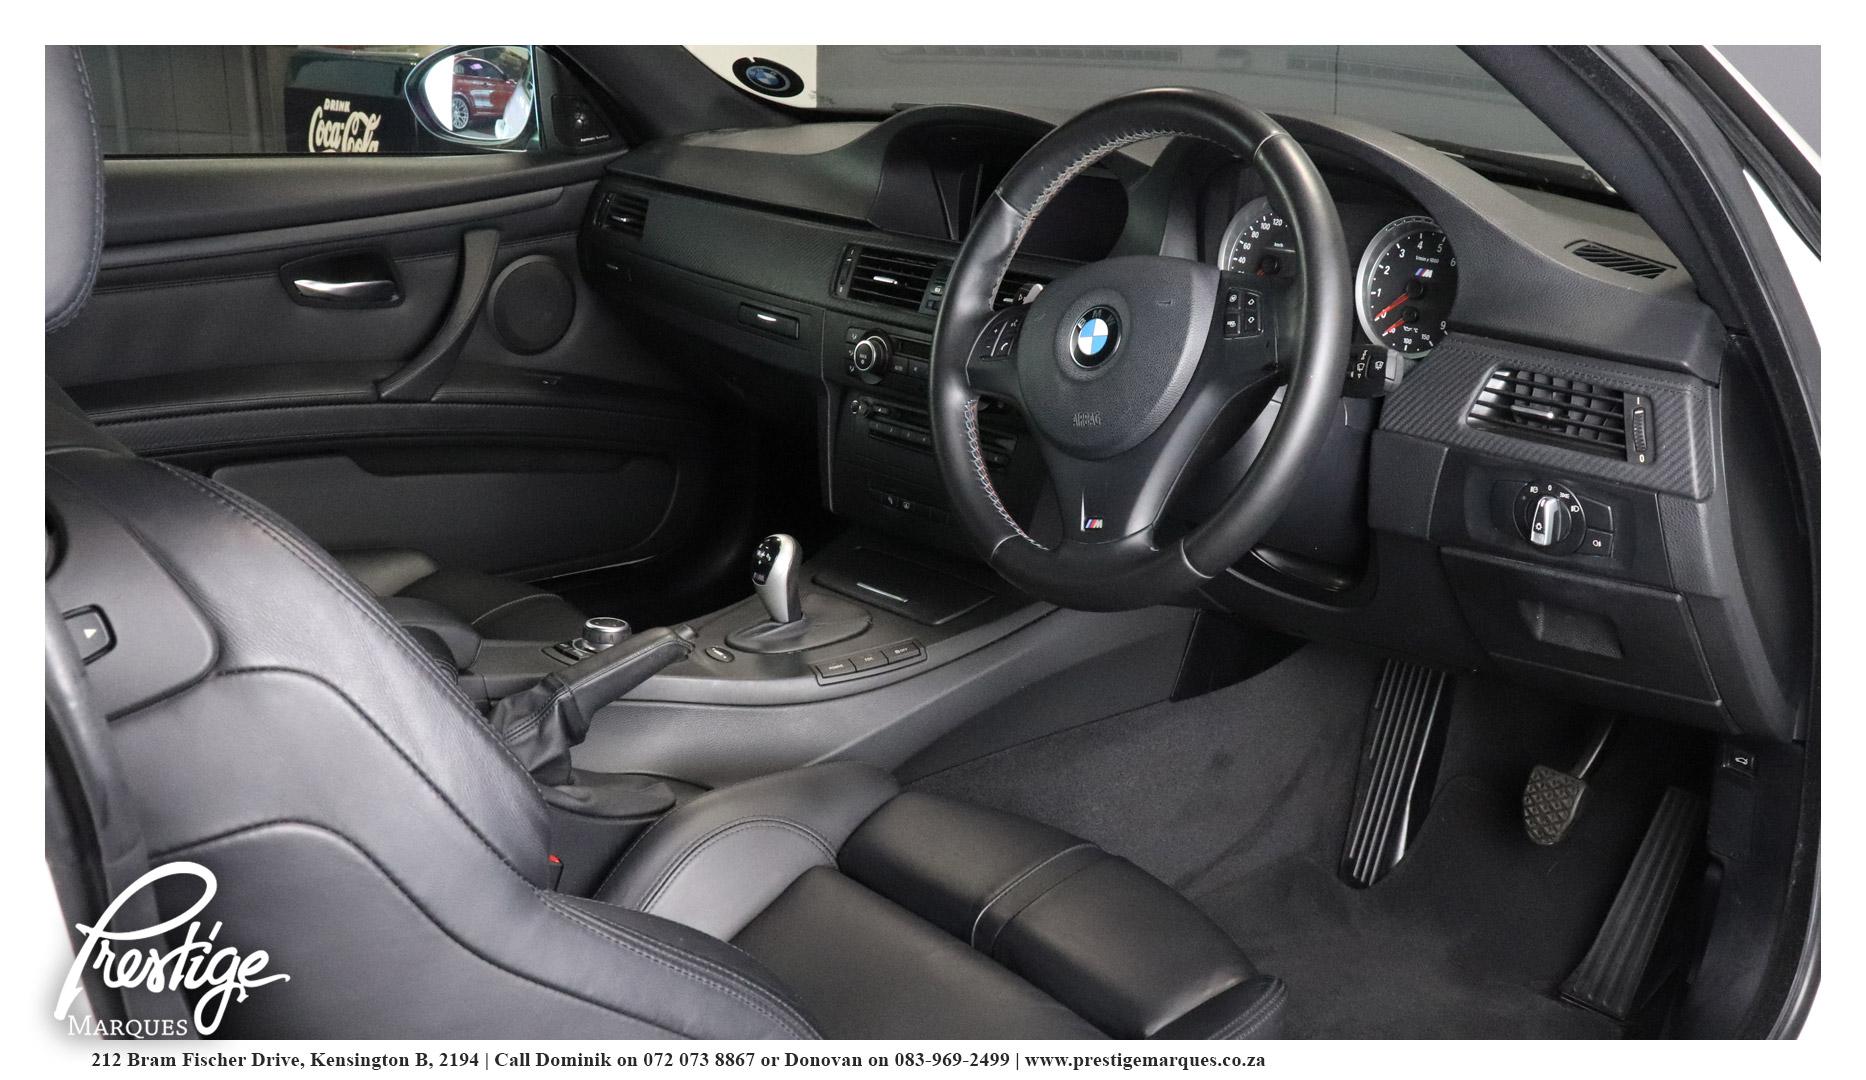 2011-BMW-E92-M3-MDCT-Competition-Package-Prestige-Marques-Randburg-Sandton-10